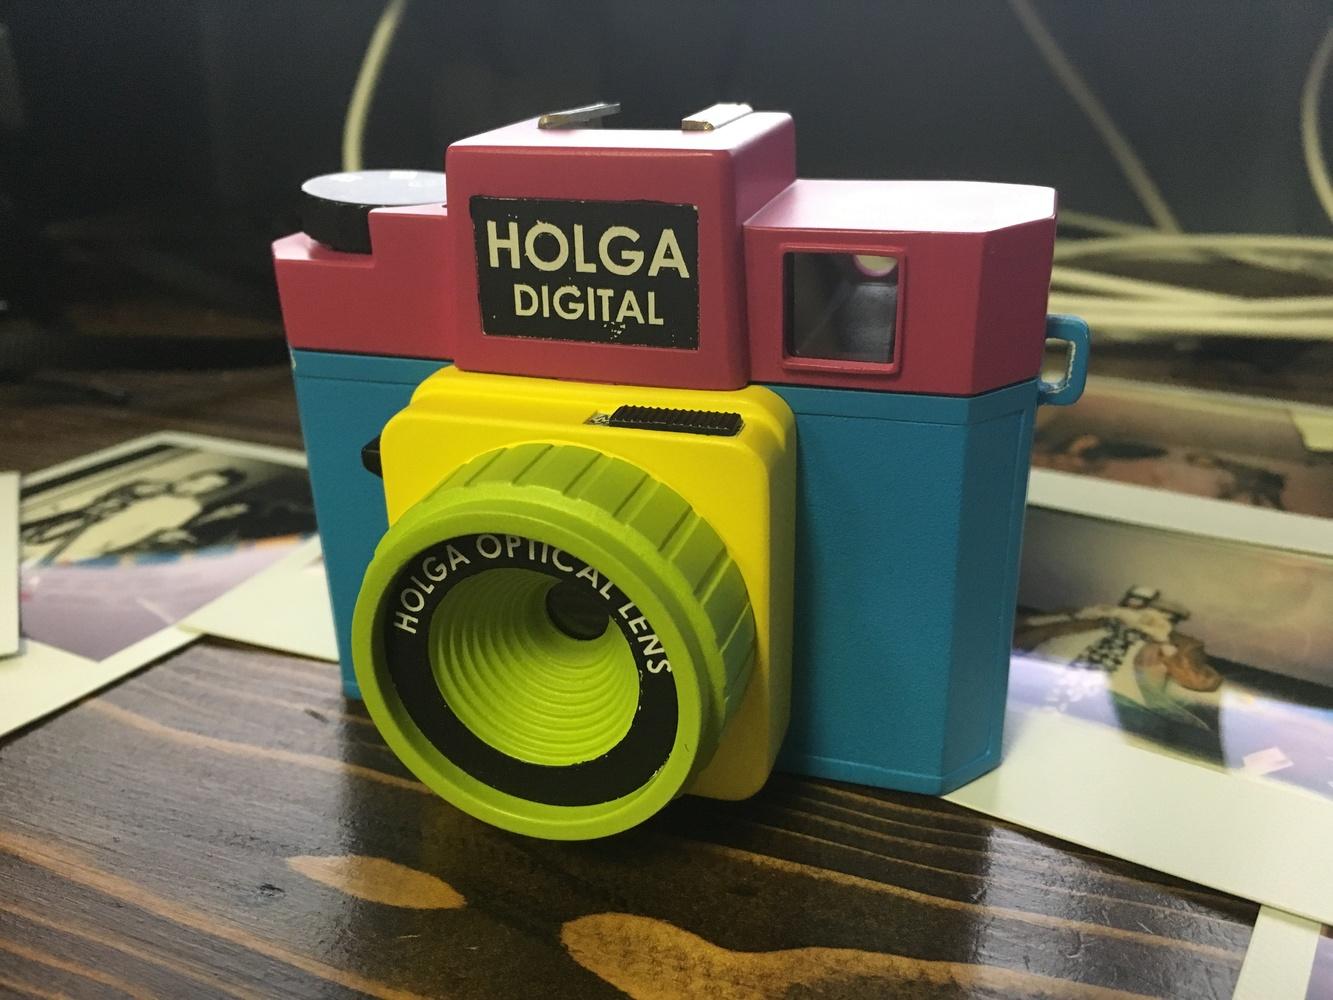 Polaroid Camera Urban Outfitters : Holga digital camera urban outfitters lomography holga d